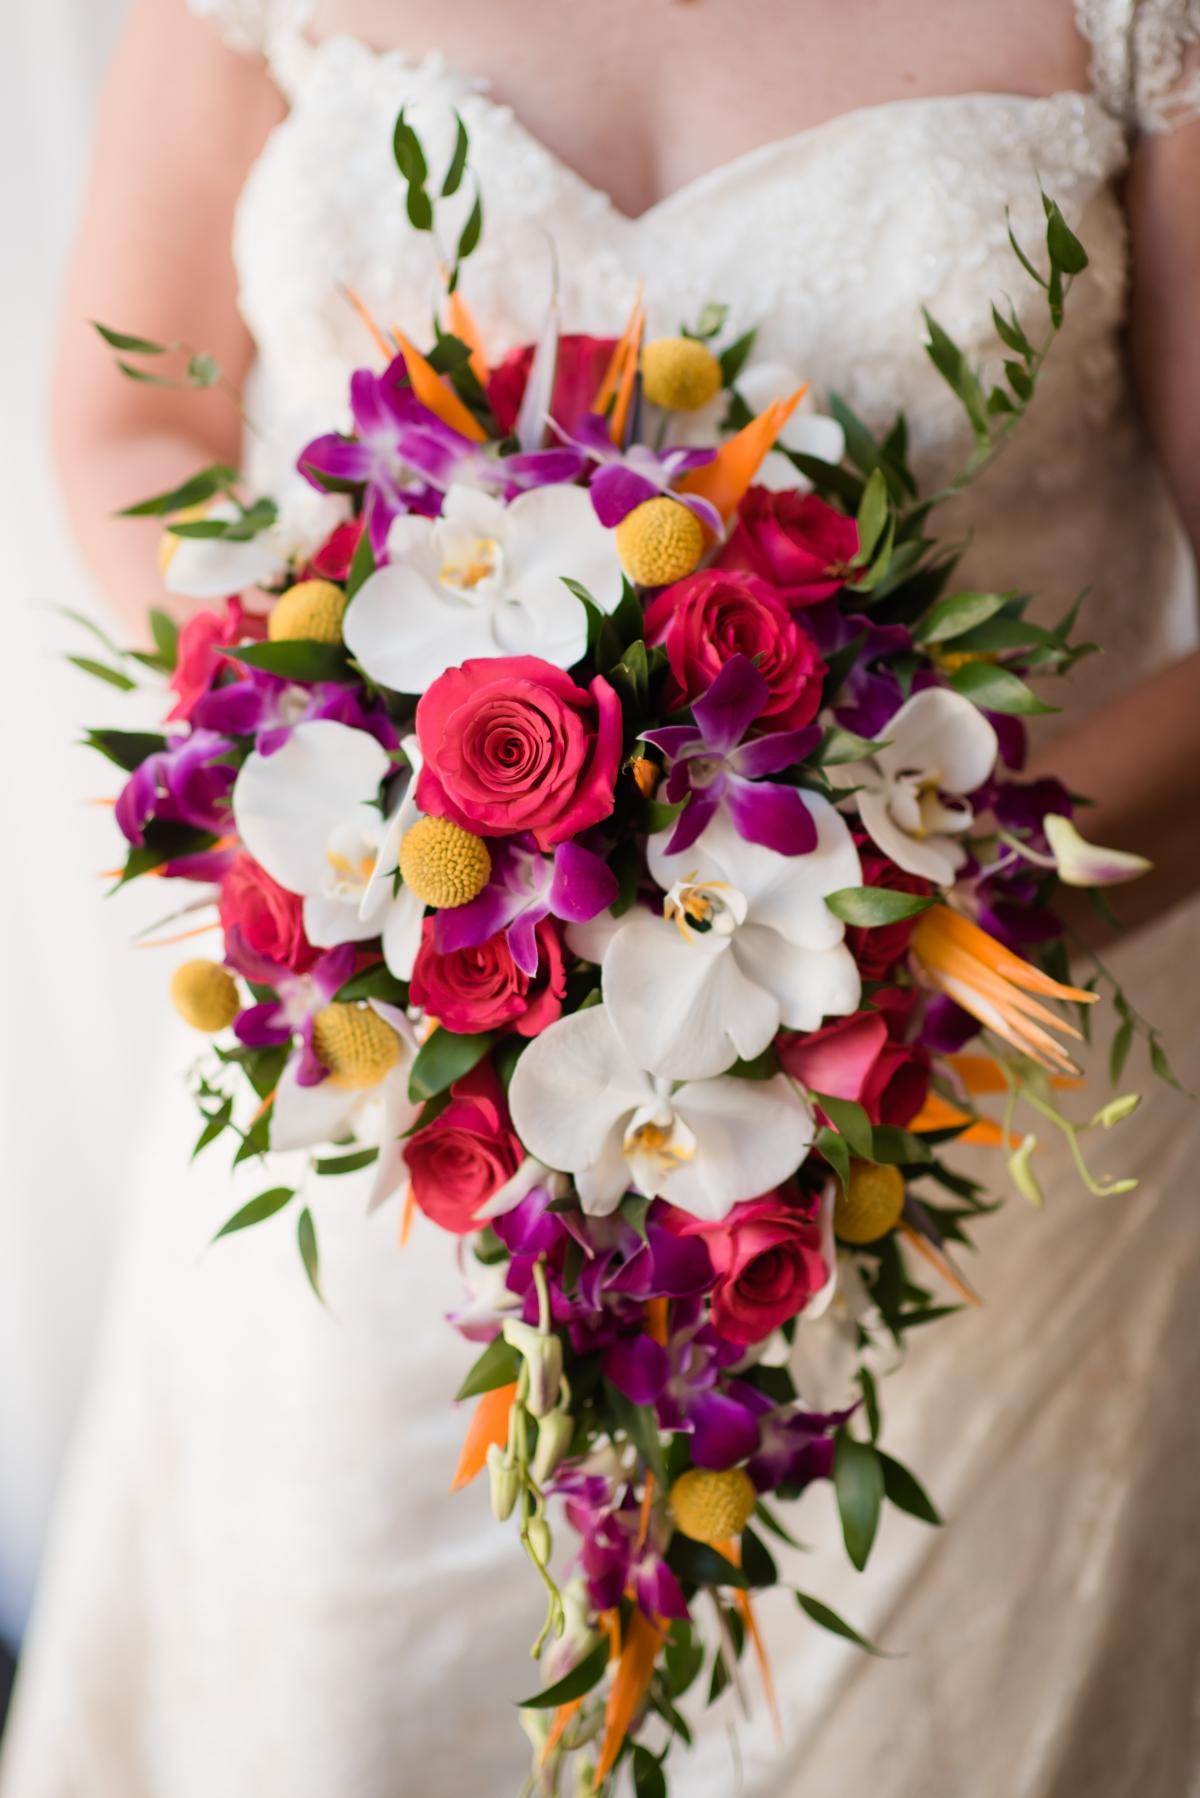 9 19 20 Lori Tiff Wedding 098